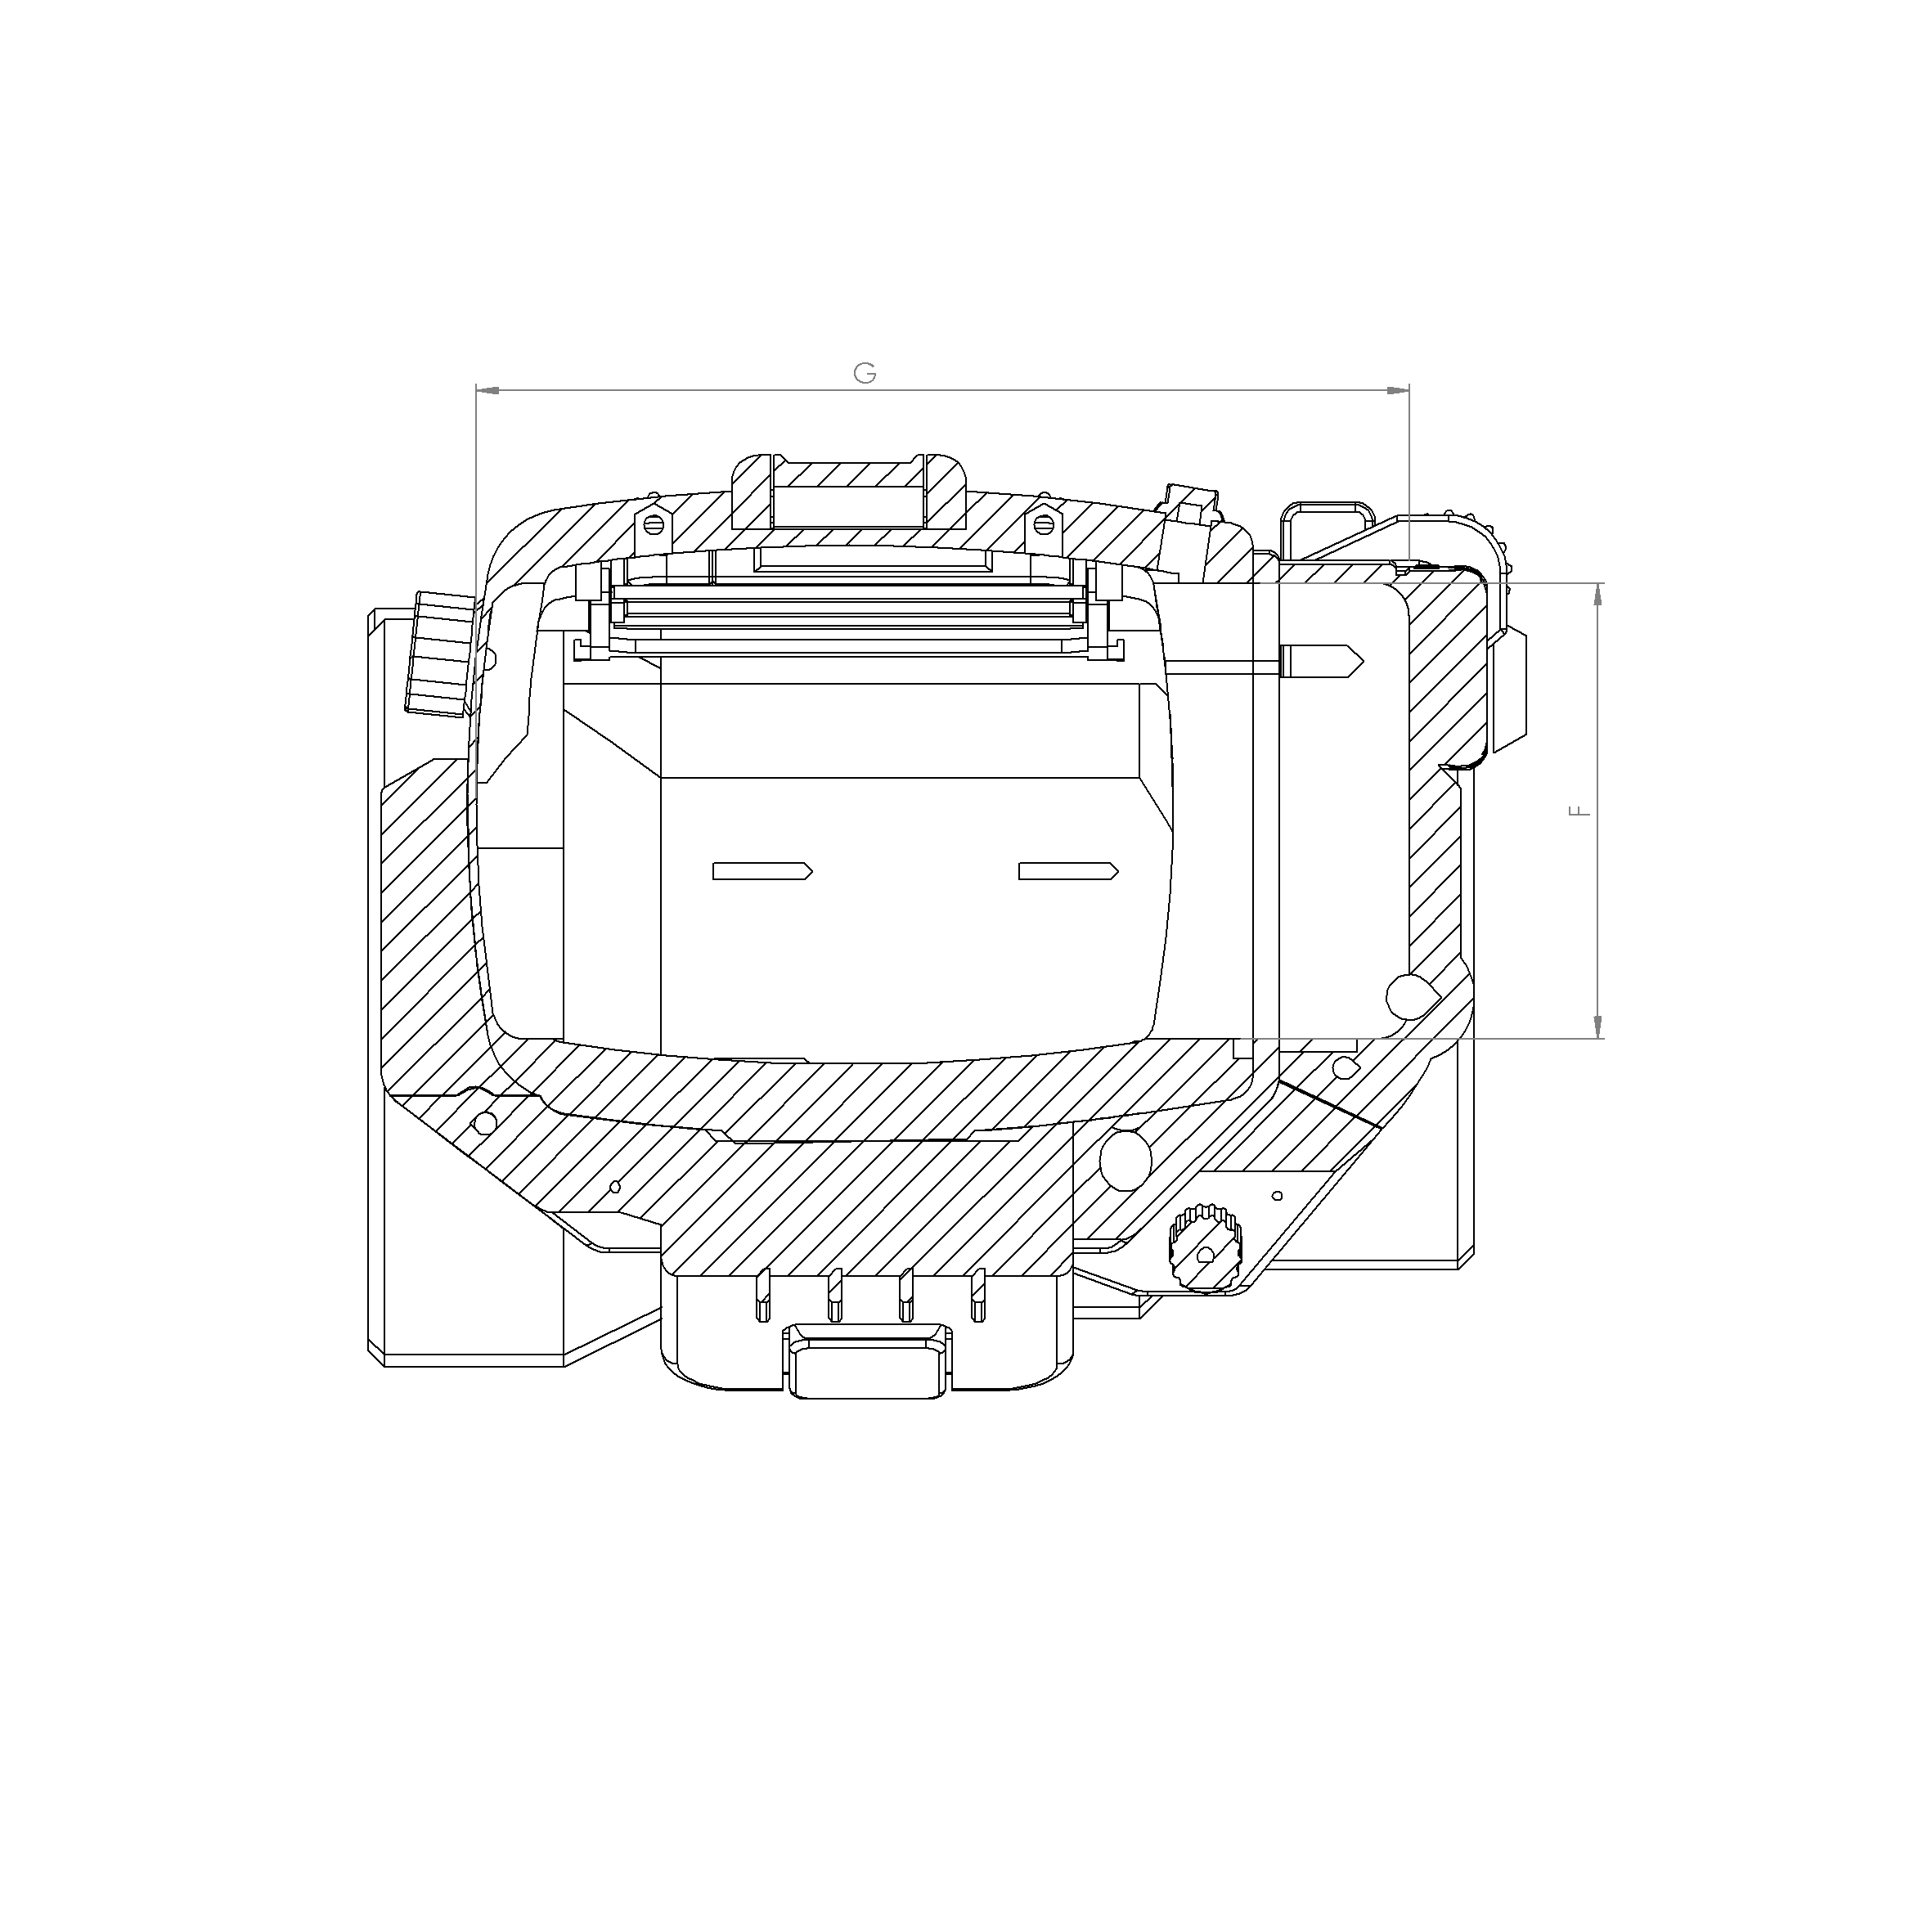 Vw Pat 2 0 Engine Diagram • Wiring Diagram For Free